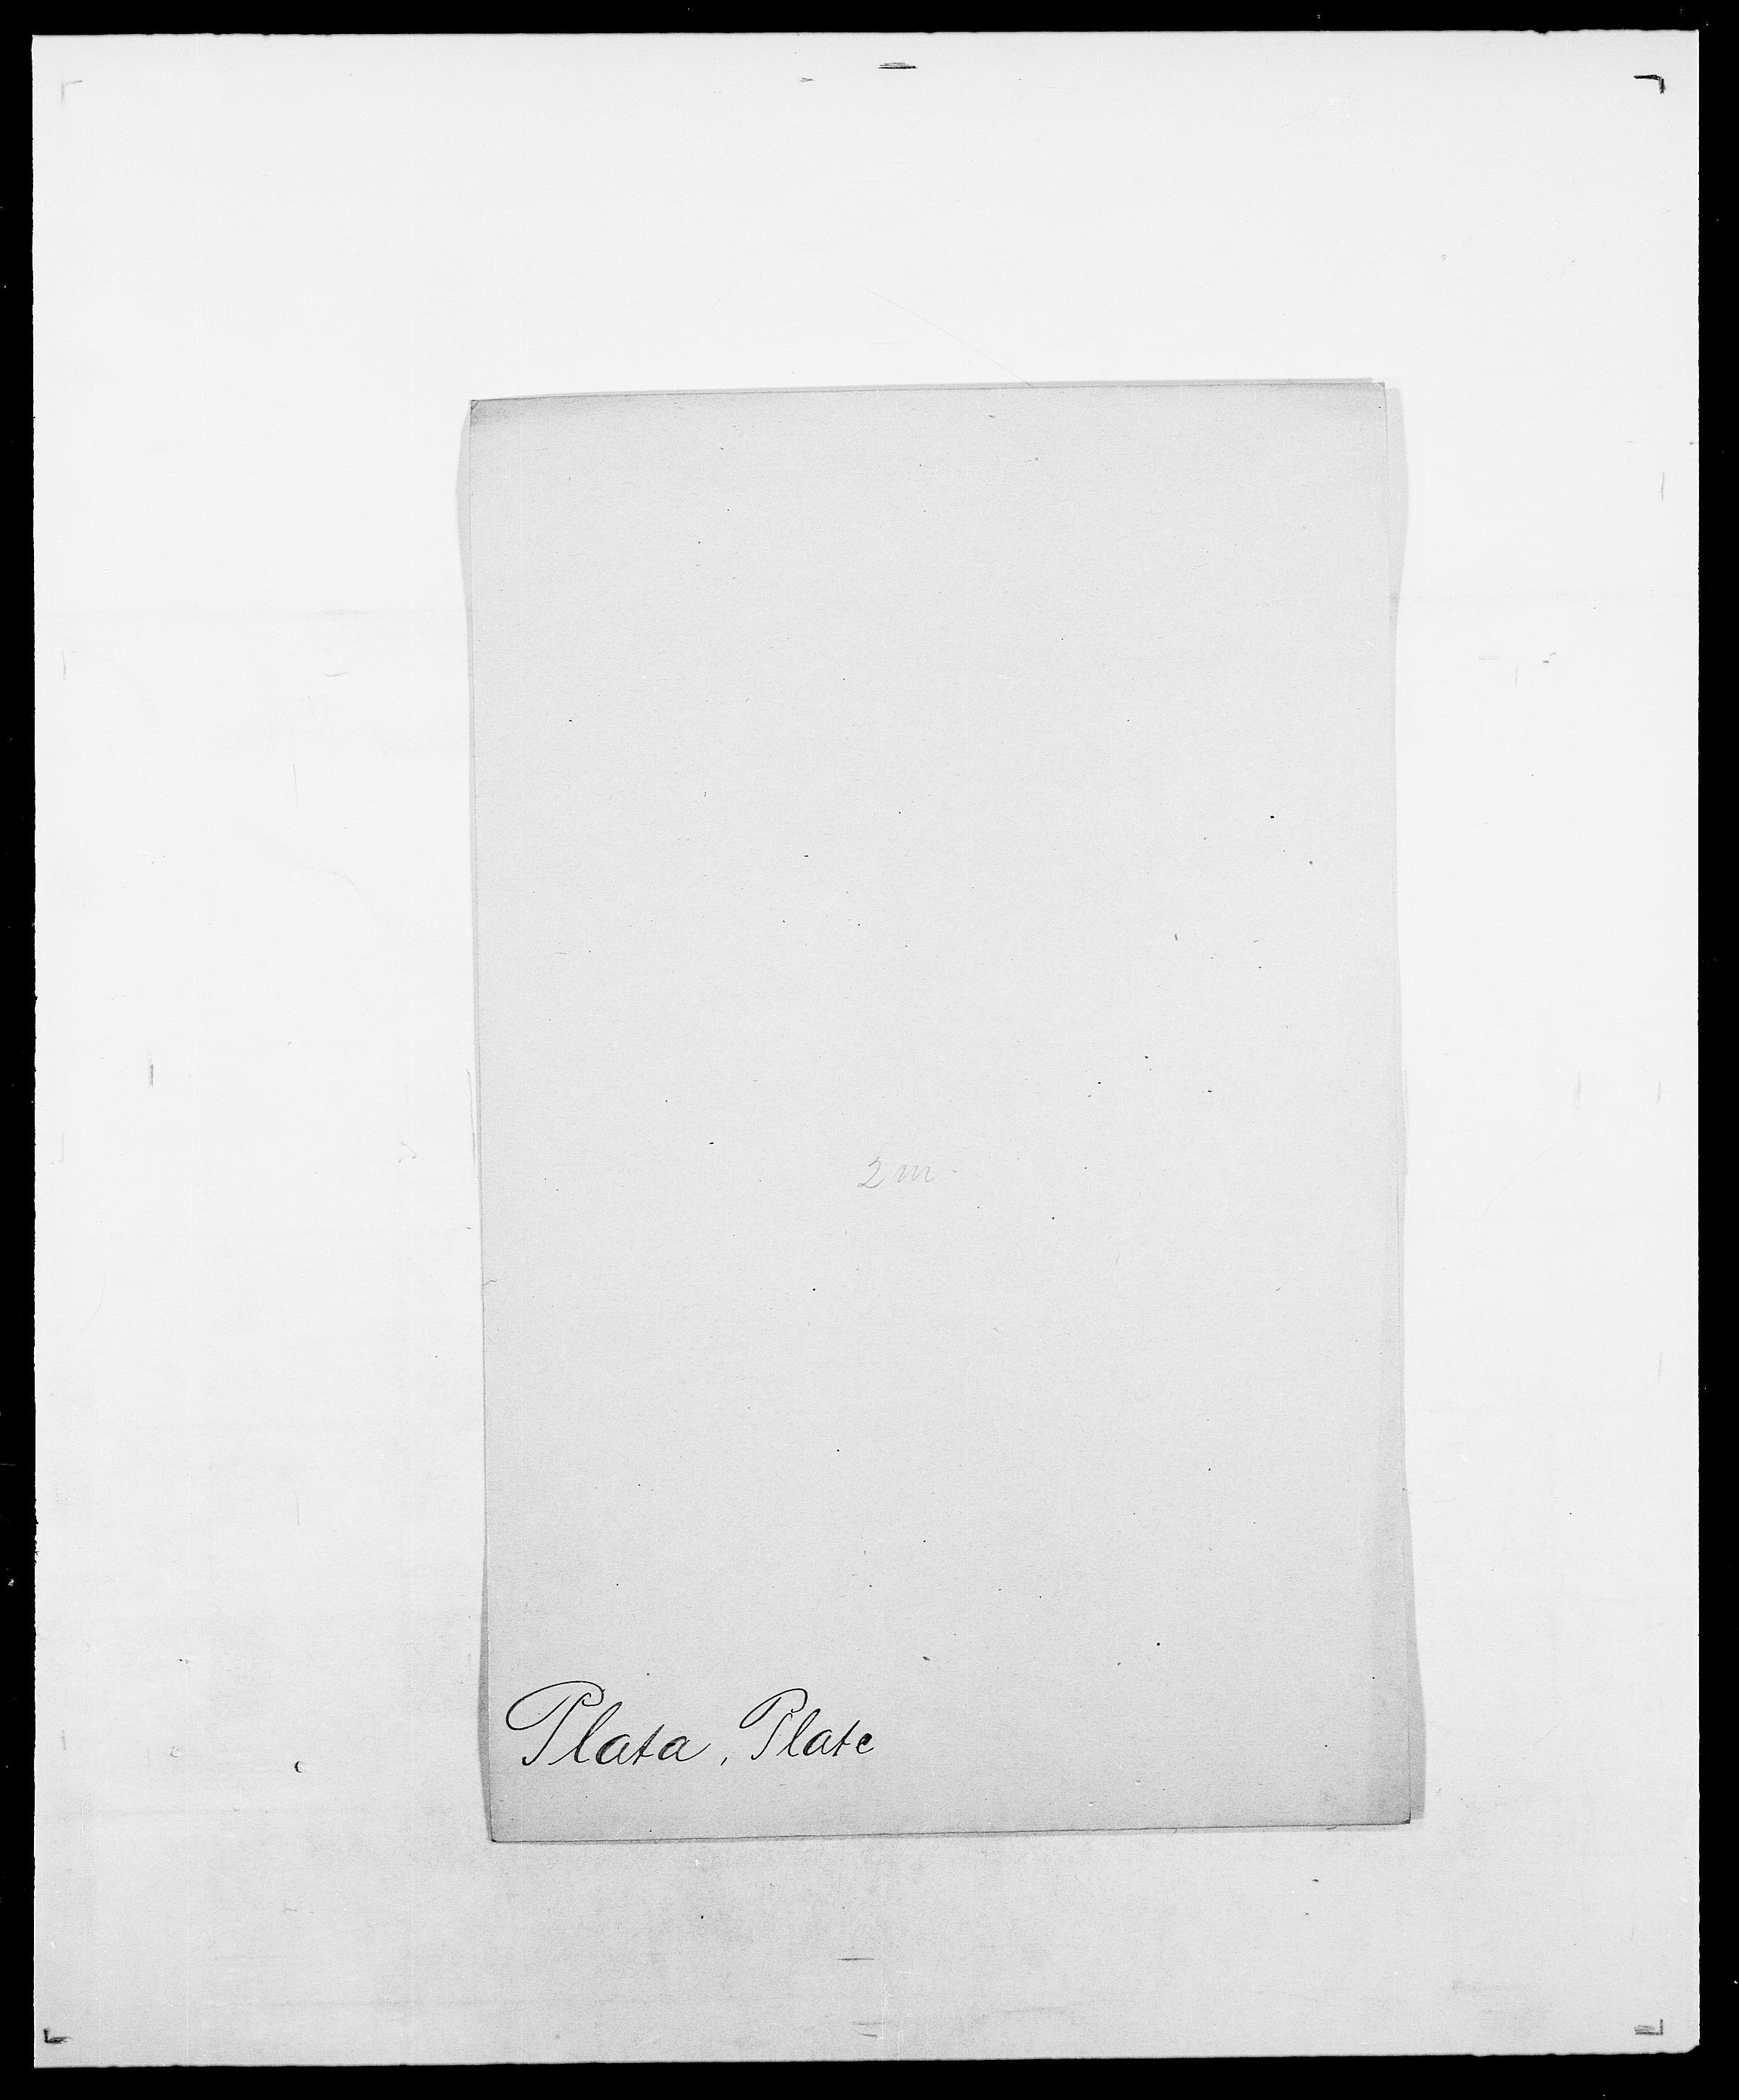 SAO, Delgobe, Charles Antoine - samling, D/Da/L0031: de Place - Raaum, s. 25